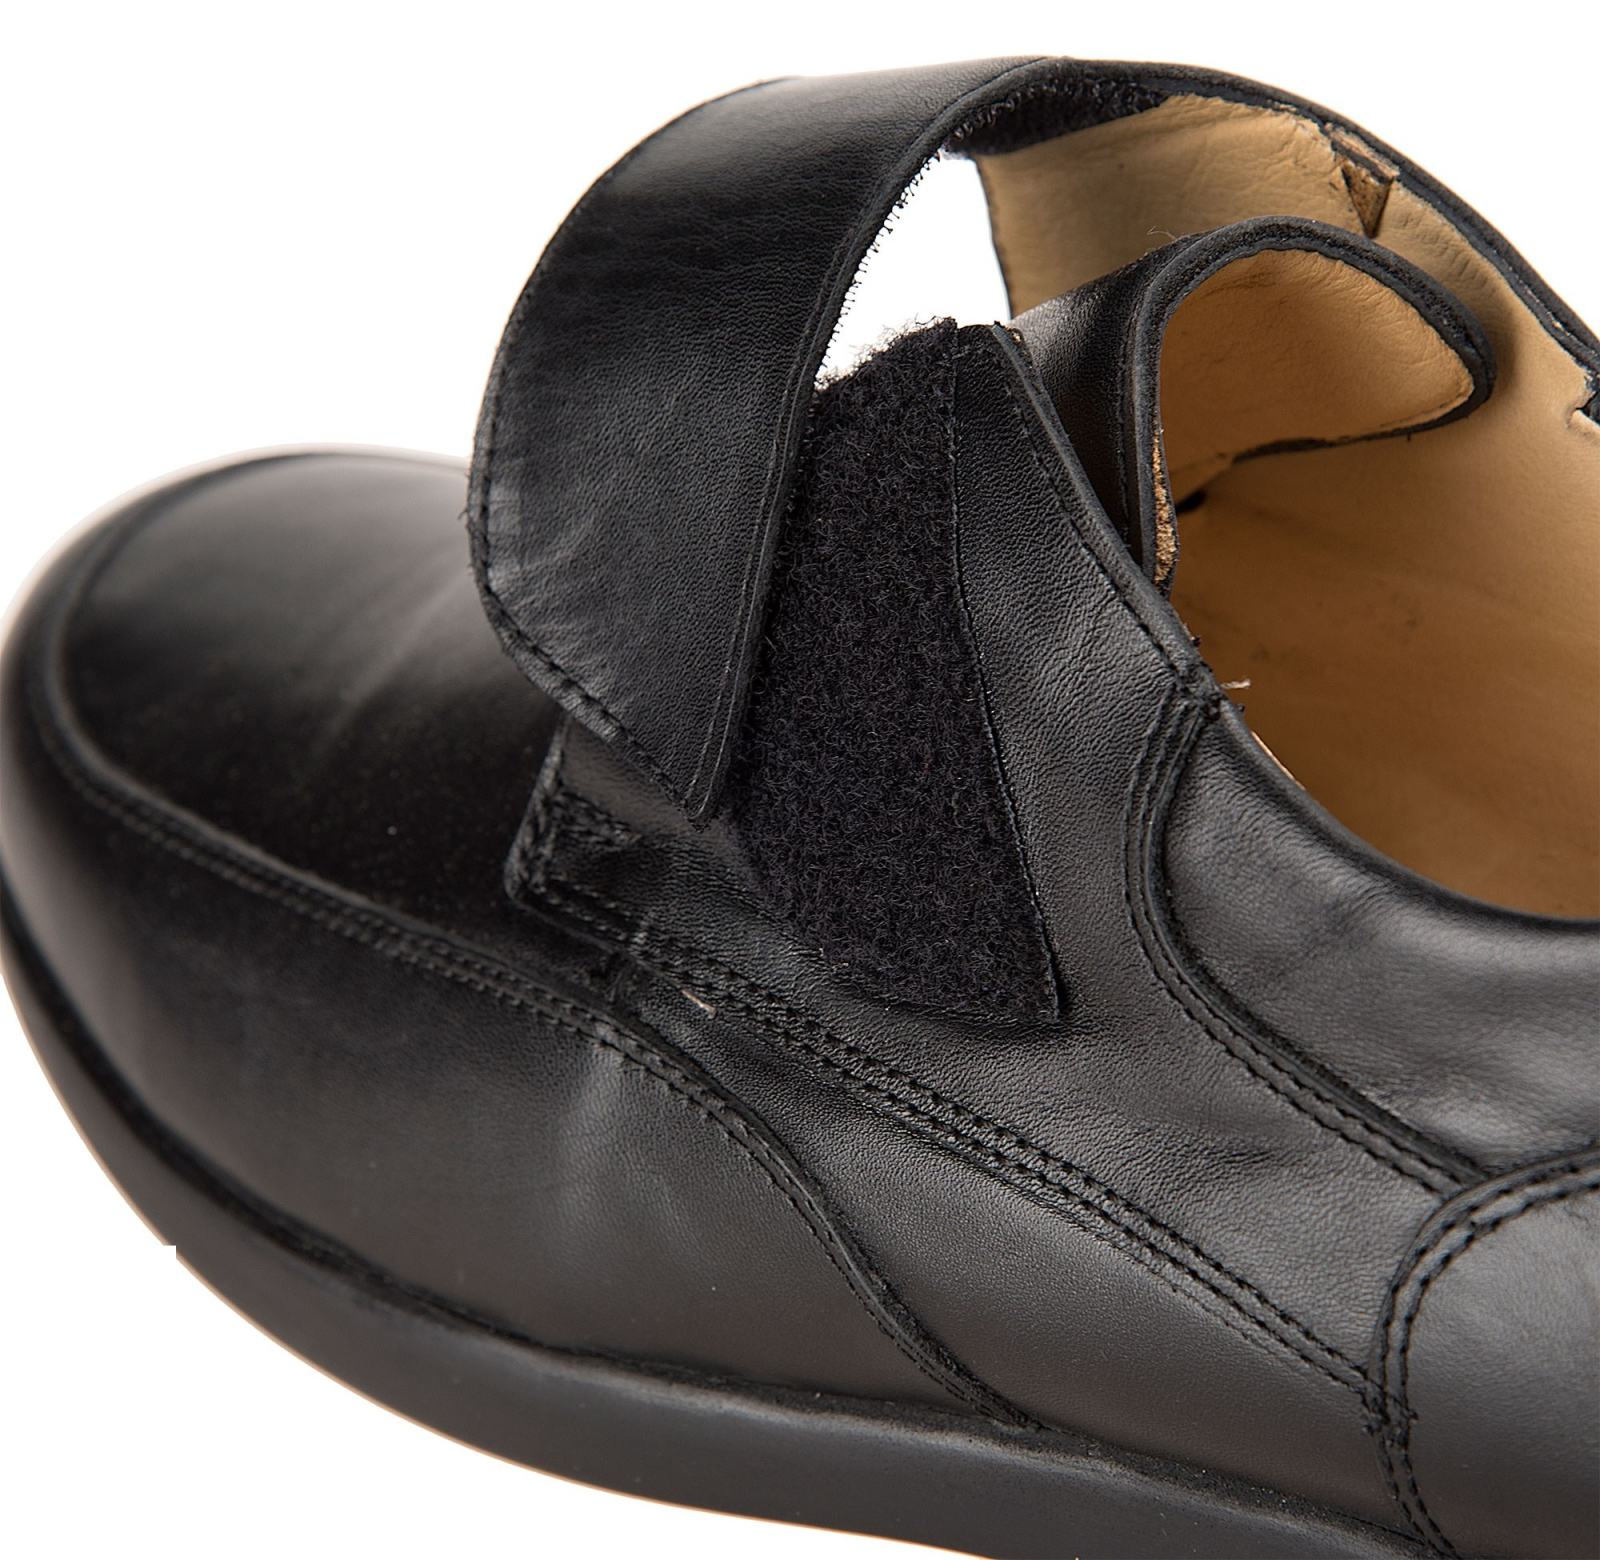 کفش اداری چرم مردانه - شهر چرم - مشکي - 5